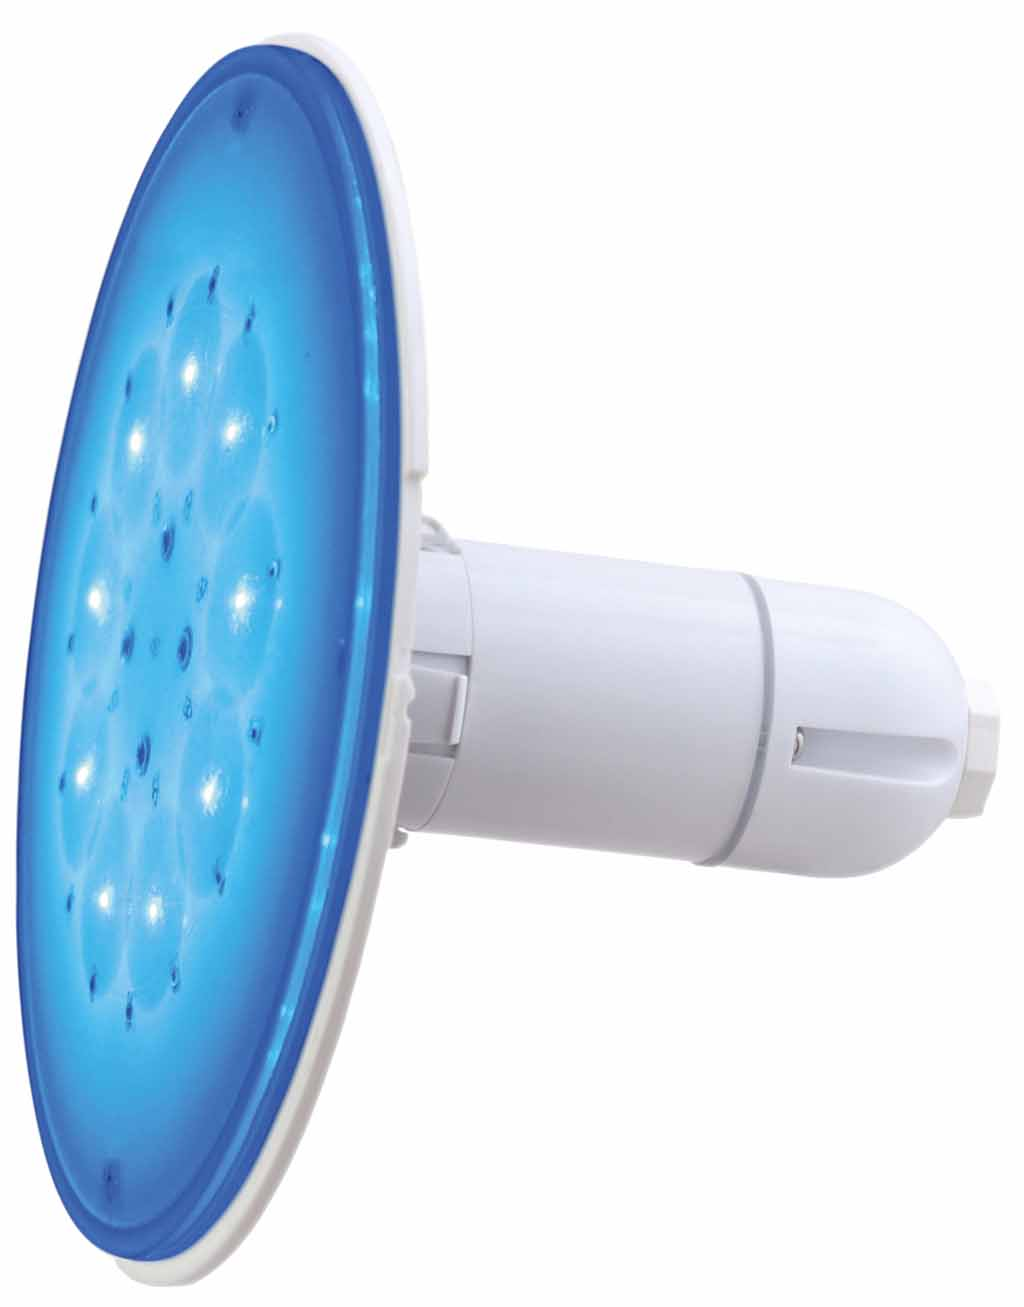 LED RGB barevné světlo Adagio 80 W, svítivost 3750 lm, 17 cm